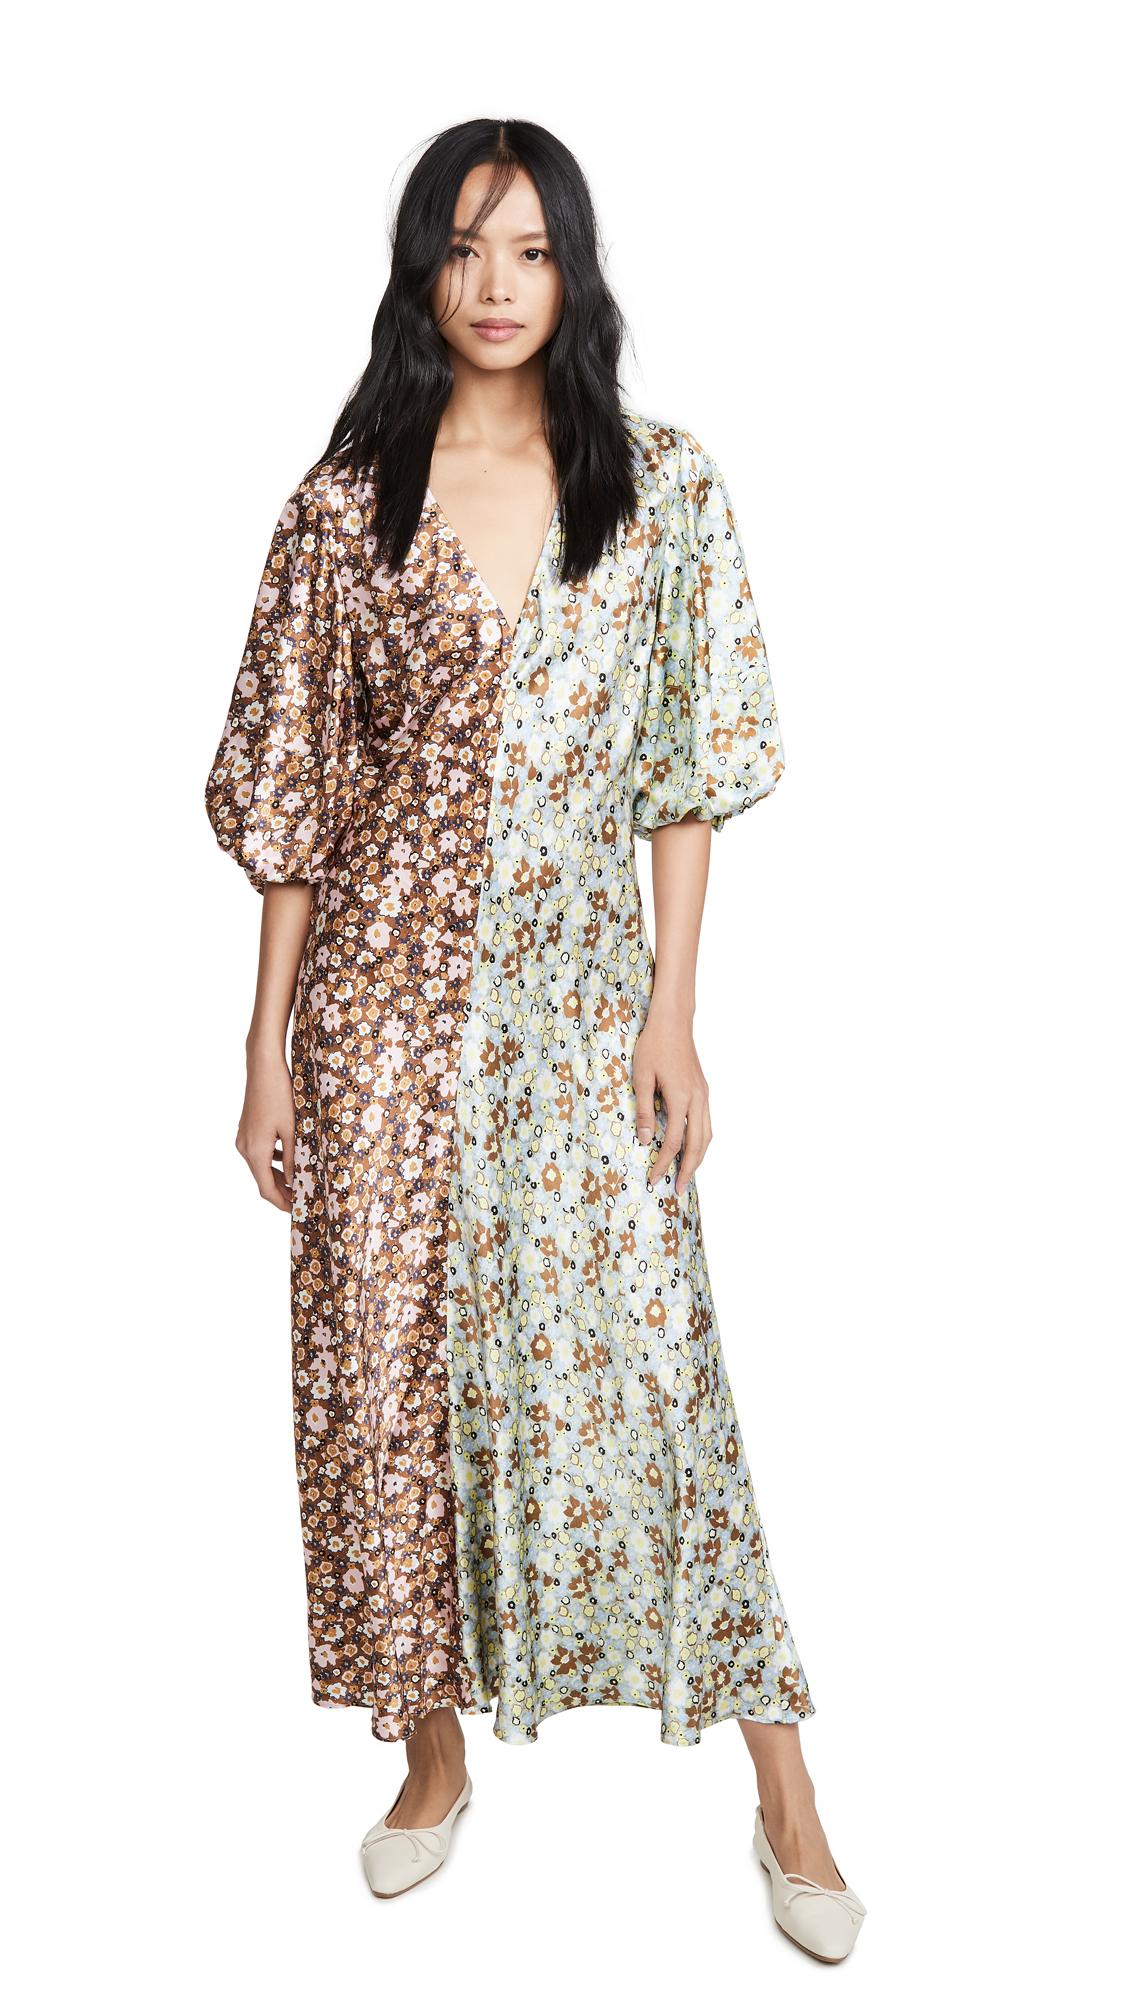 Buy Lee Mathews Zoe Puff Sleeve Dress online beautiful Lee Mathews Clothing, Dresses